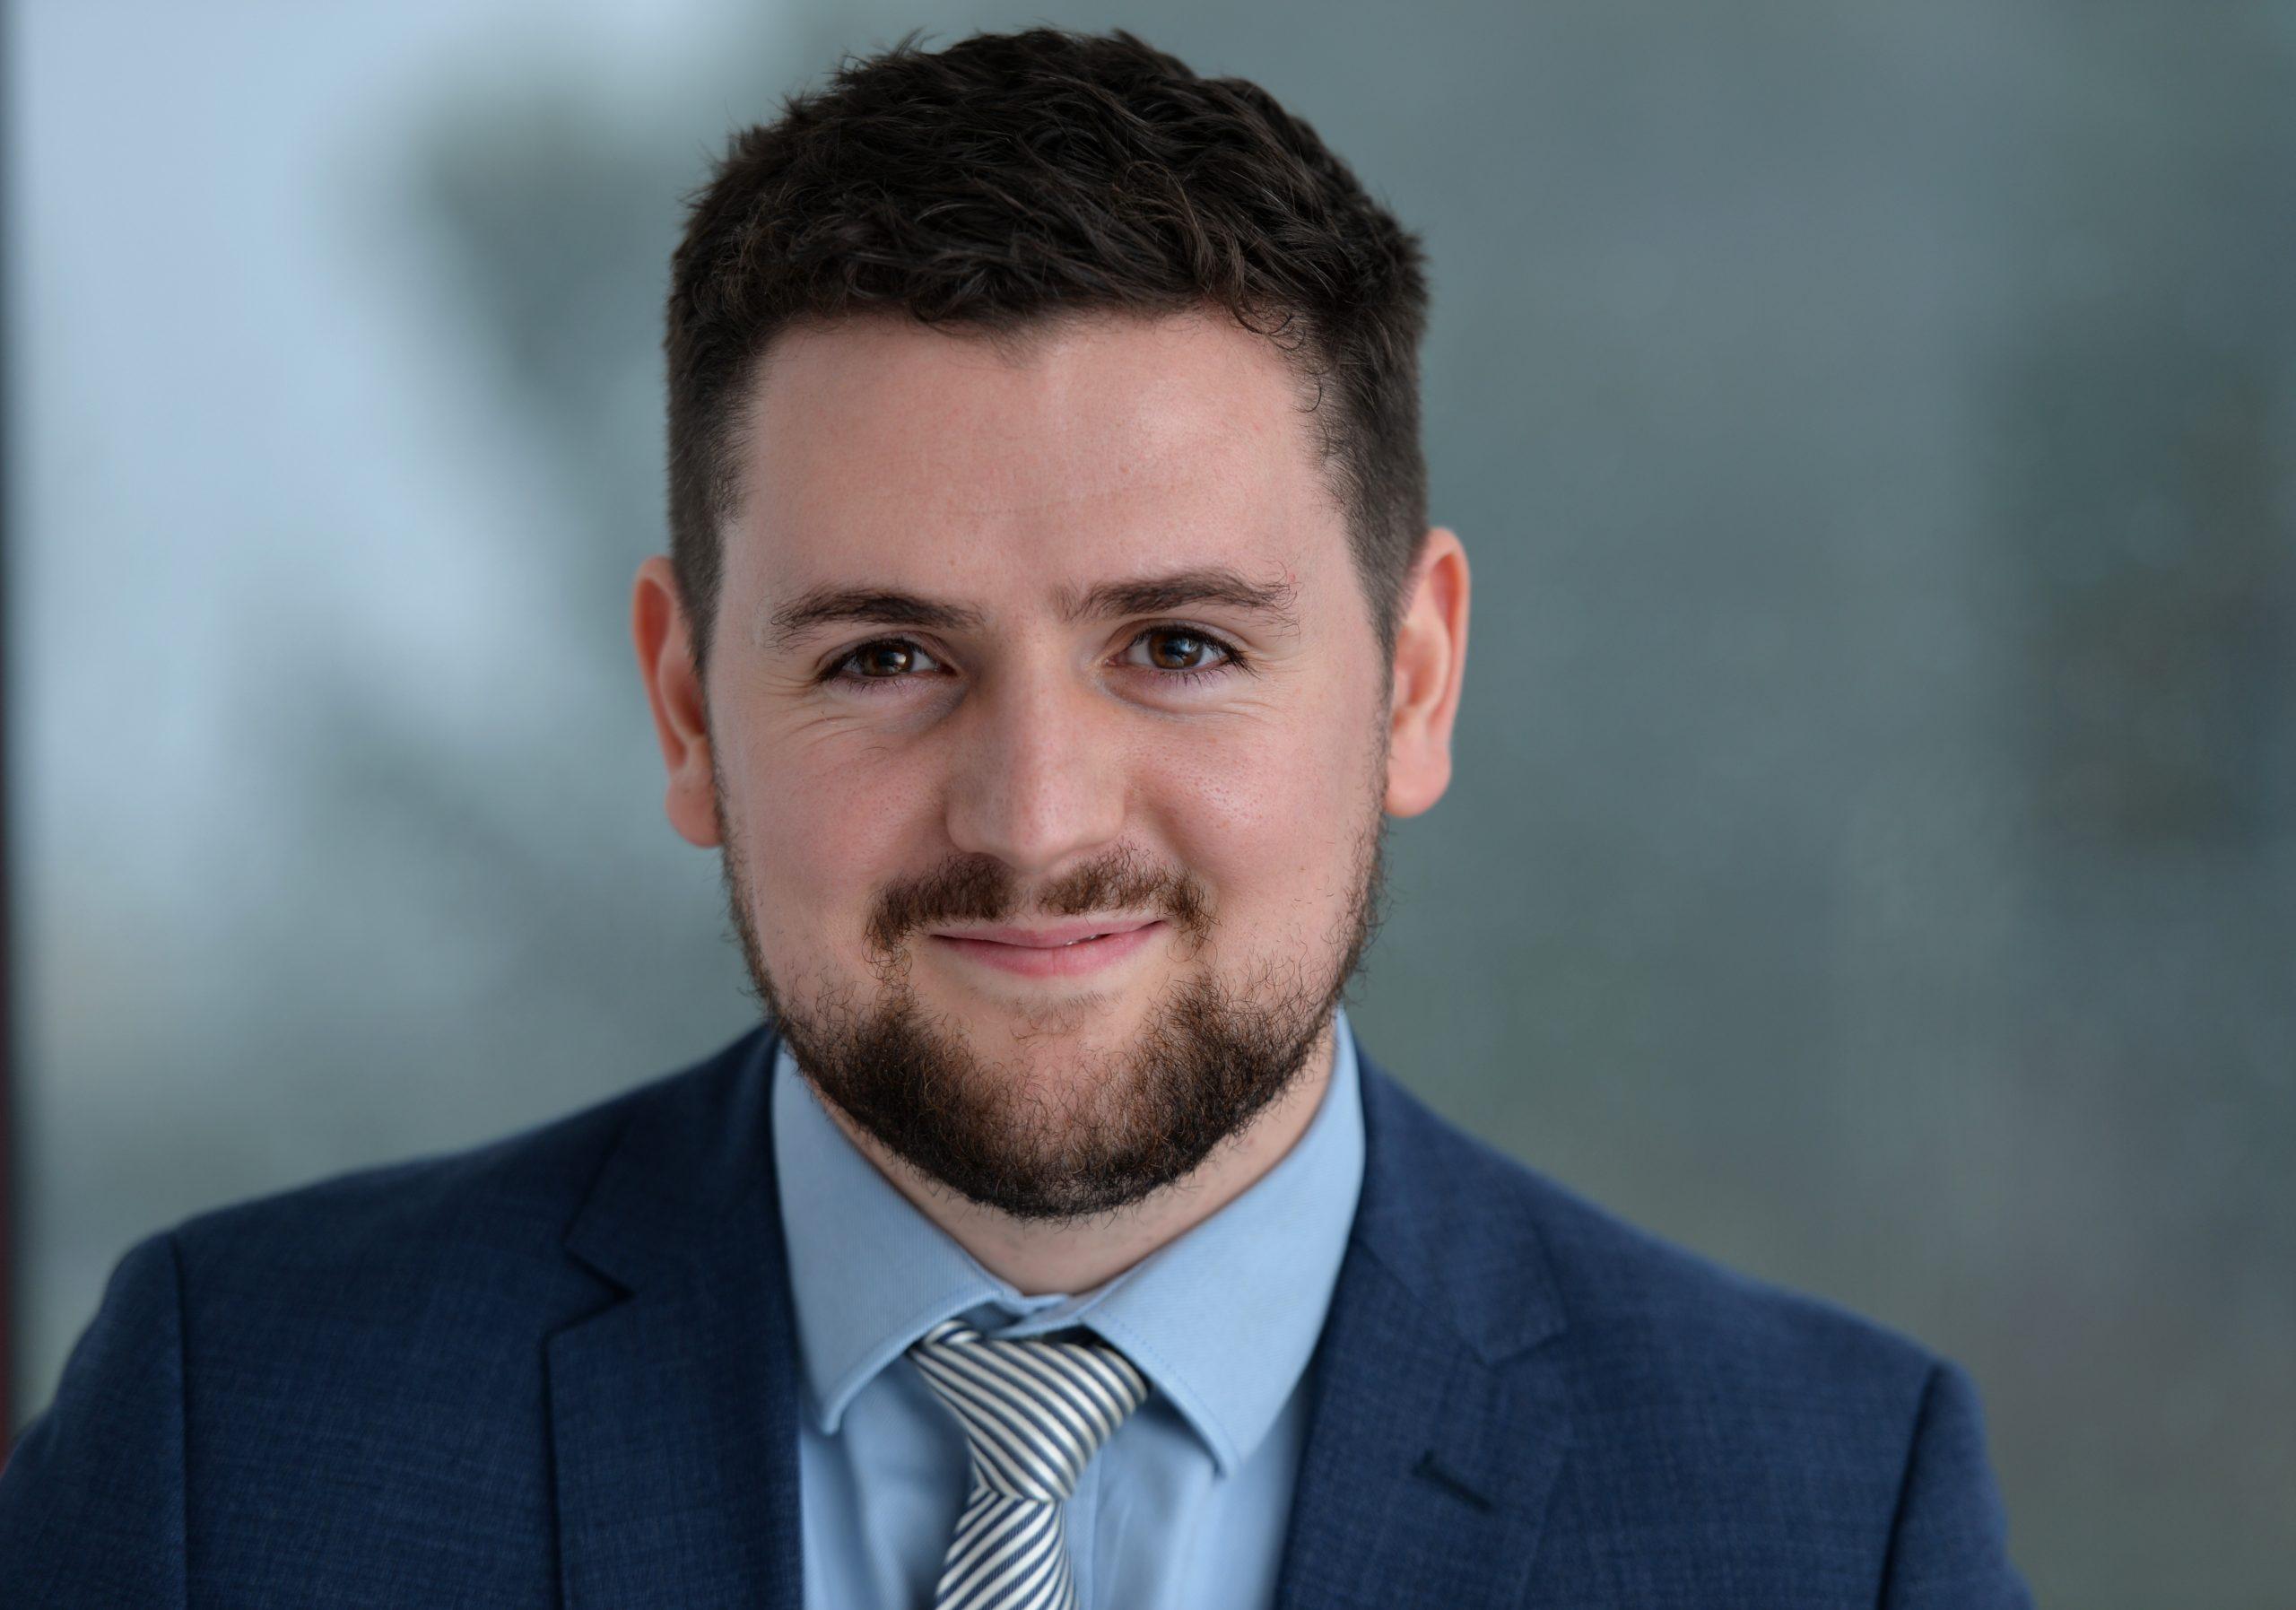 HYFIRE APPOINTS TOM CRANE AS BUSINESS UNIT DIRECTOR